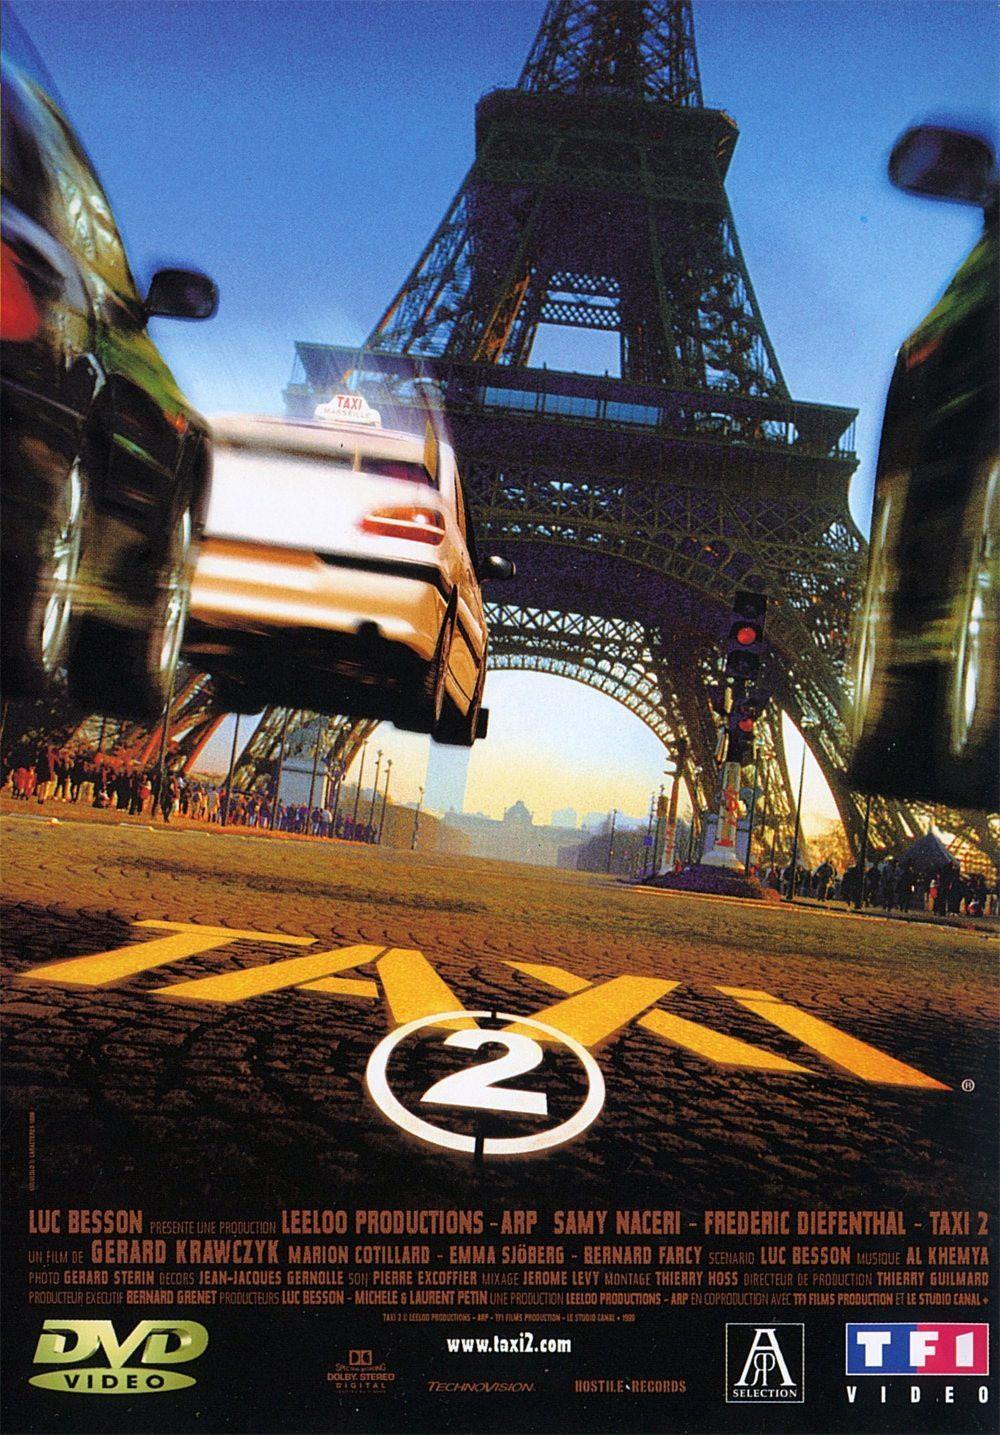 Taxi 2 Filmes Online Gratis Filmes Sala De Cinema